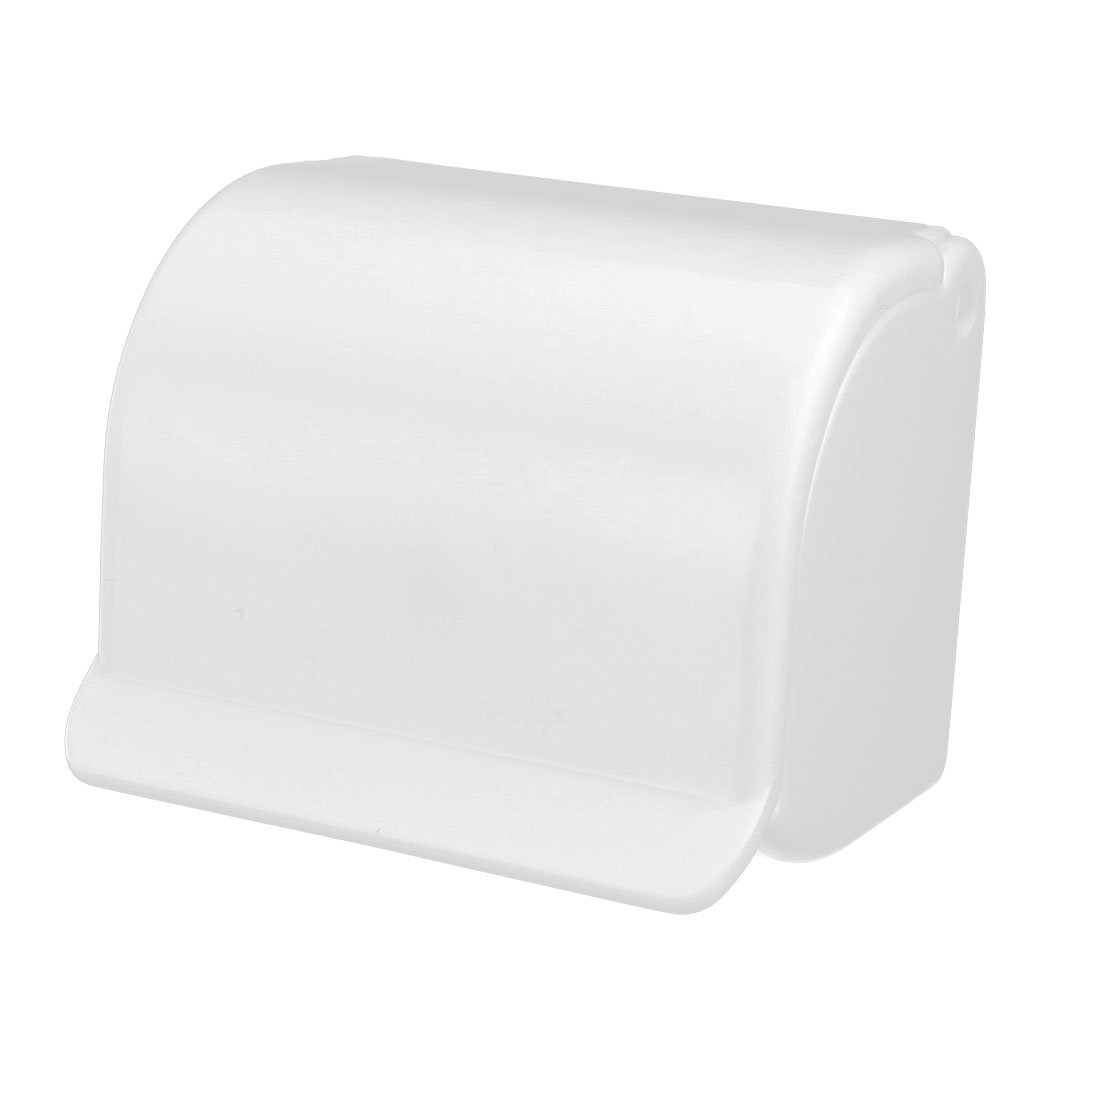 Man Bathroom Plastic Paste Strap Hanger Storage Rack Shaver Razor Holder White - image 5 de 5